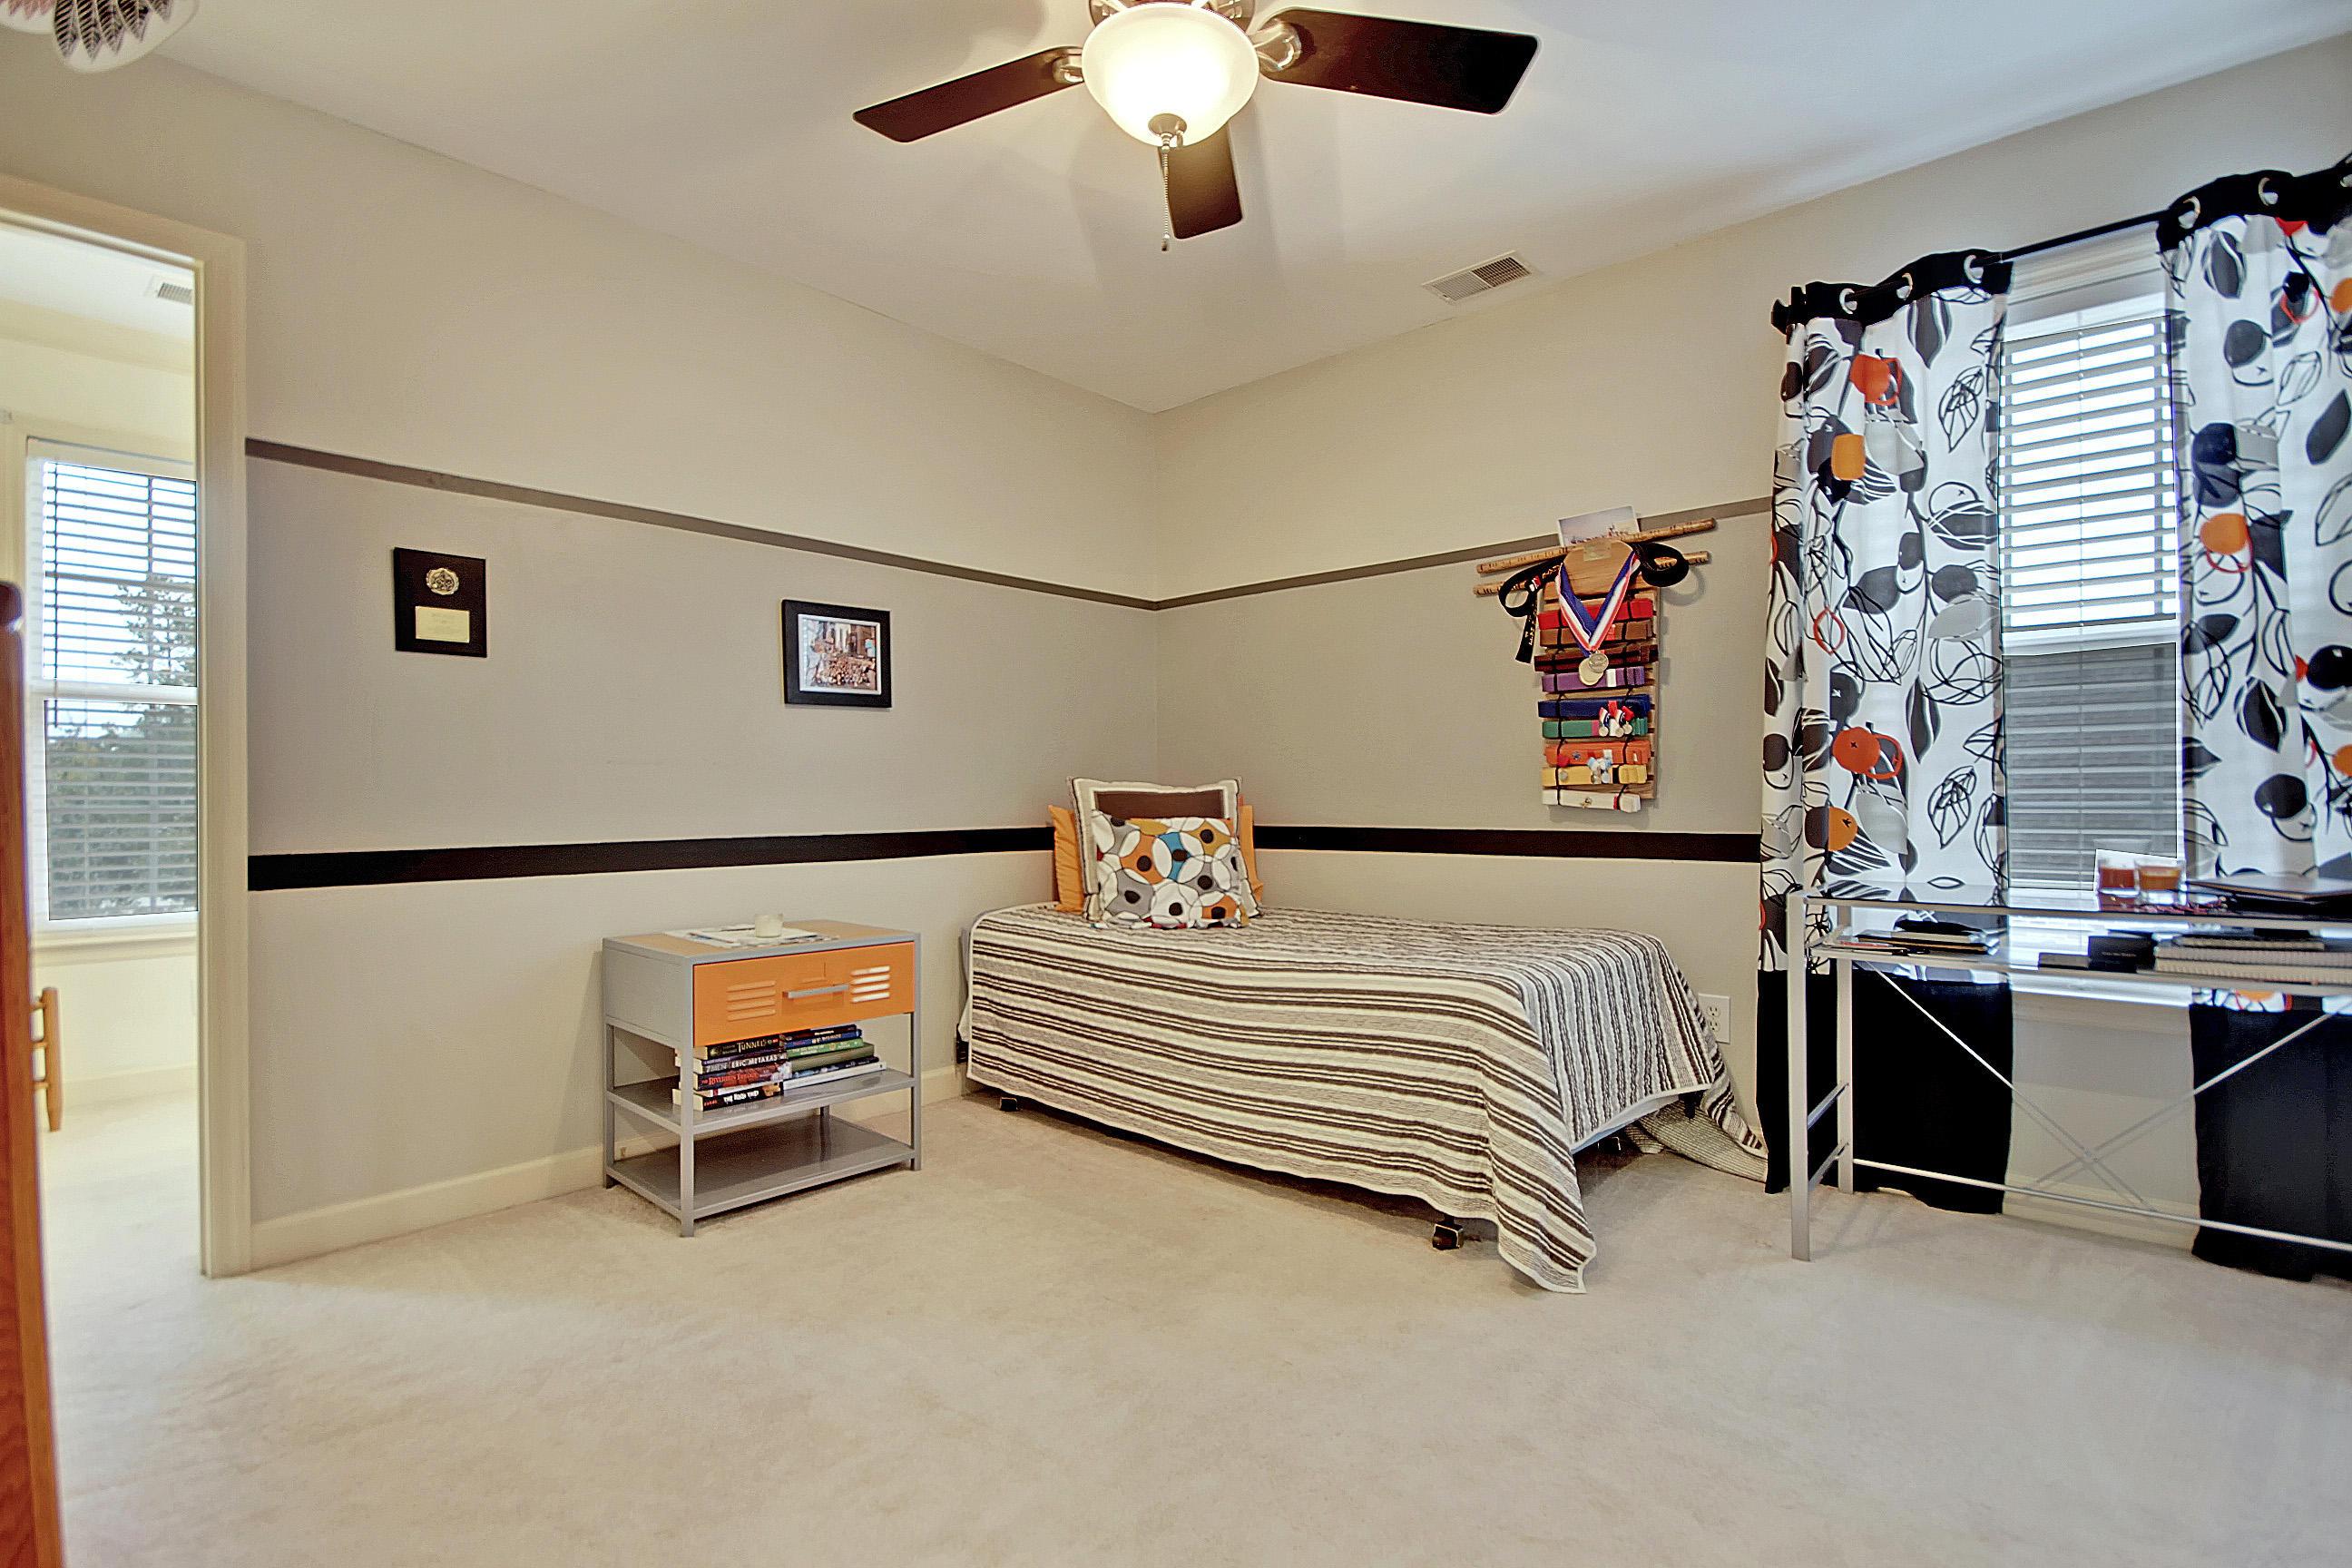 Dunes West Homes For Sale - 2449 Darts Cove, Mount Pleasant, SC - 7